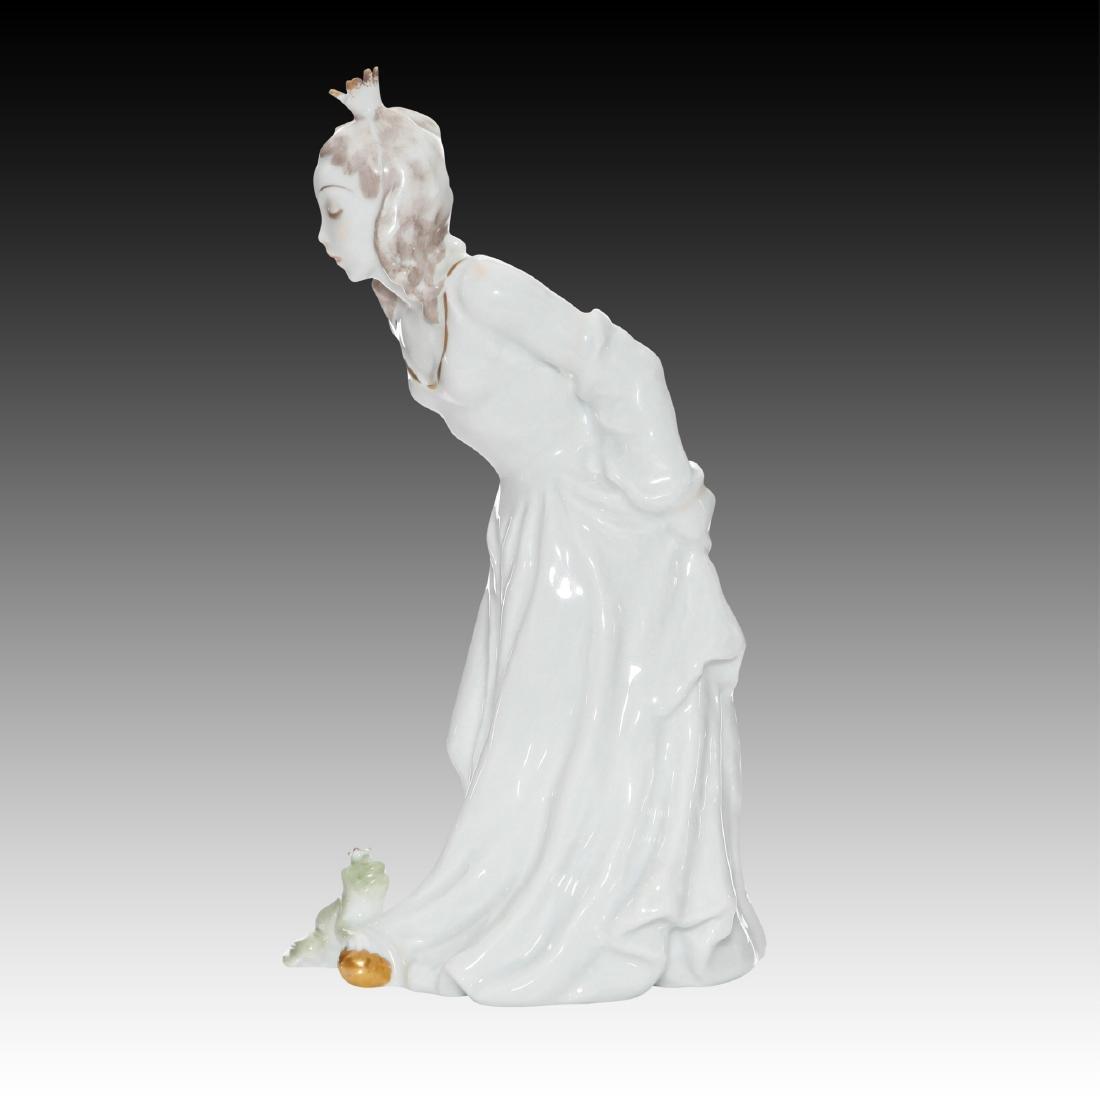 Rosenthal Figurine Princess and the Frog